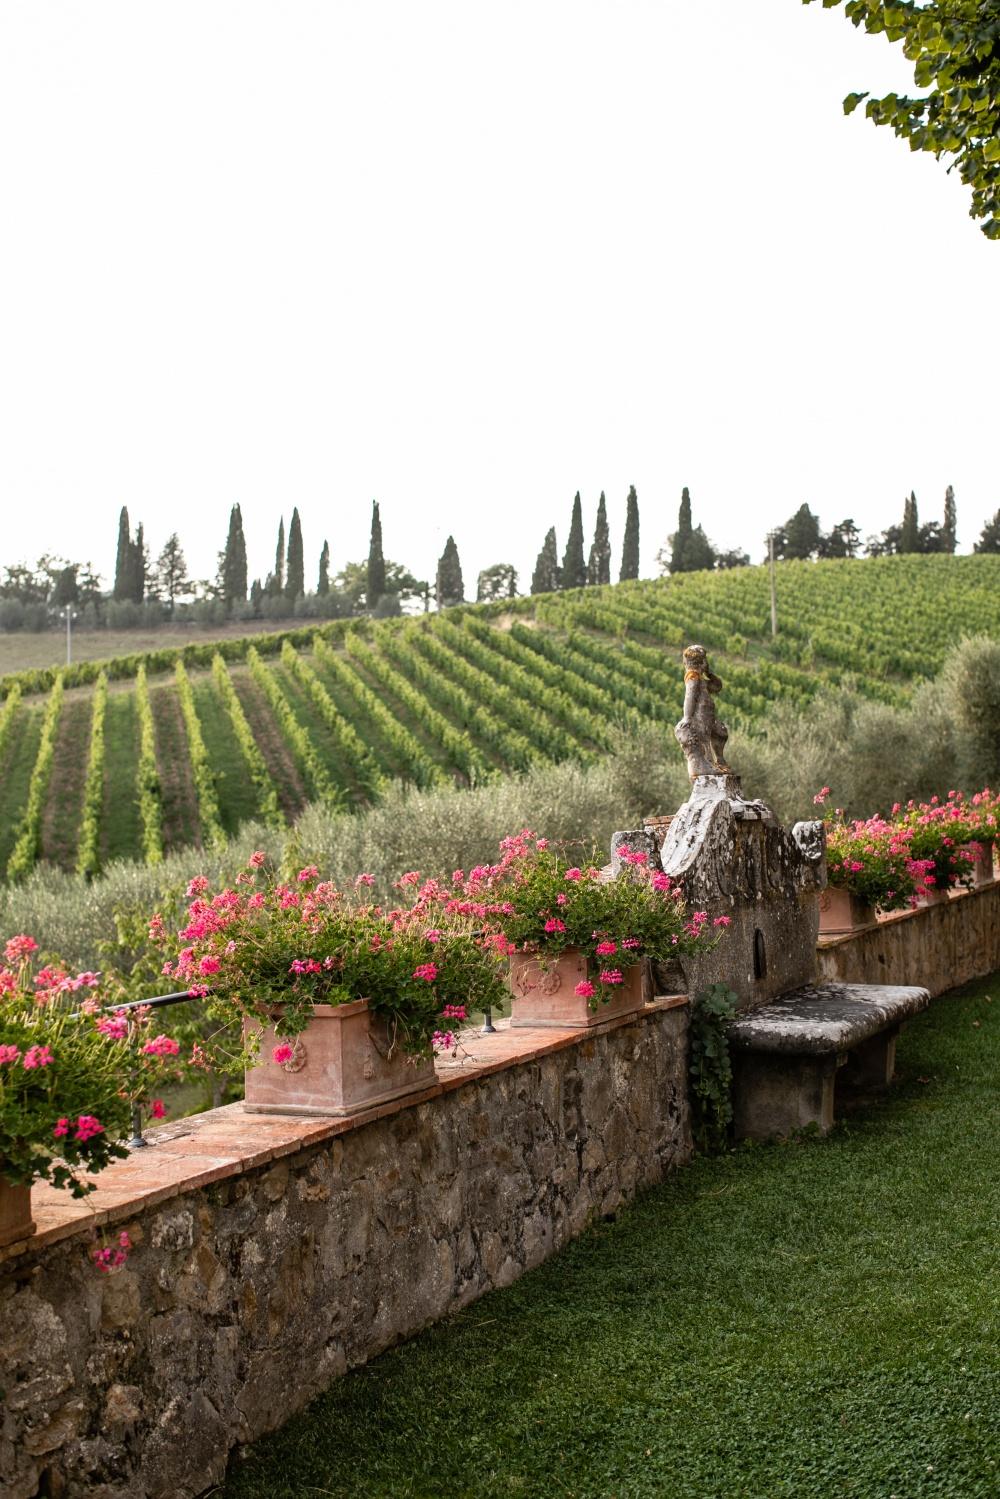 landscape view in siena